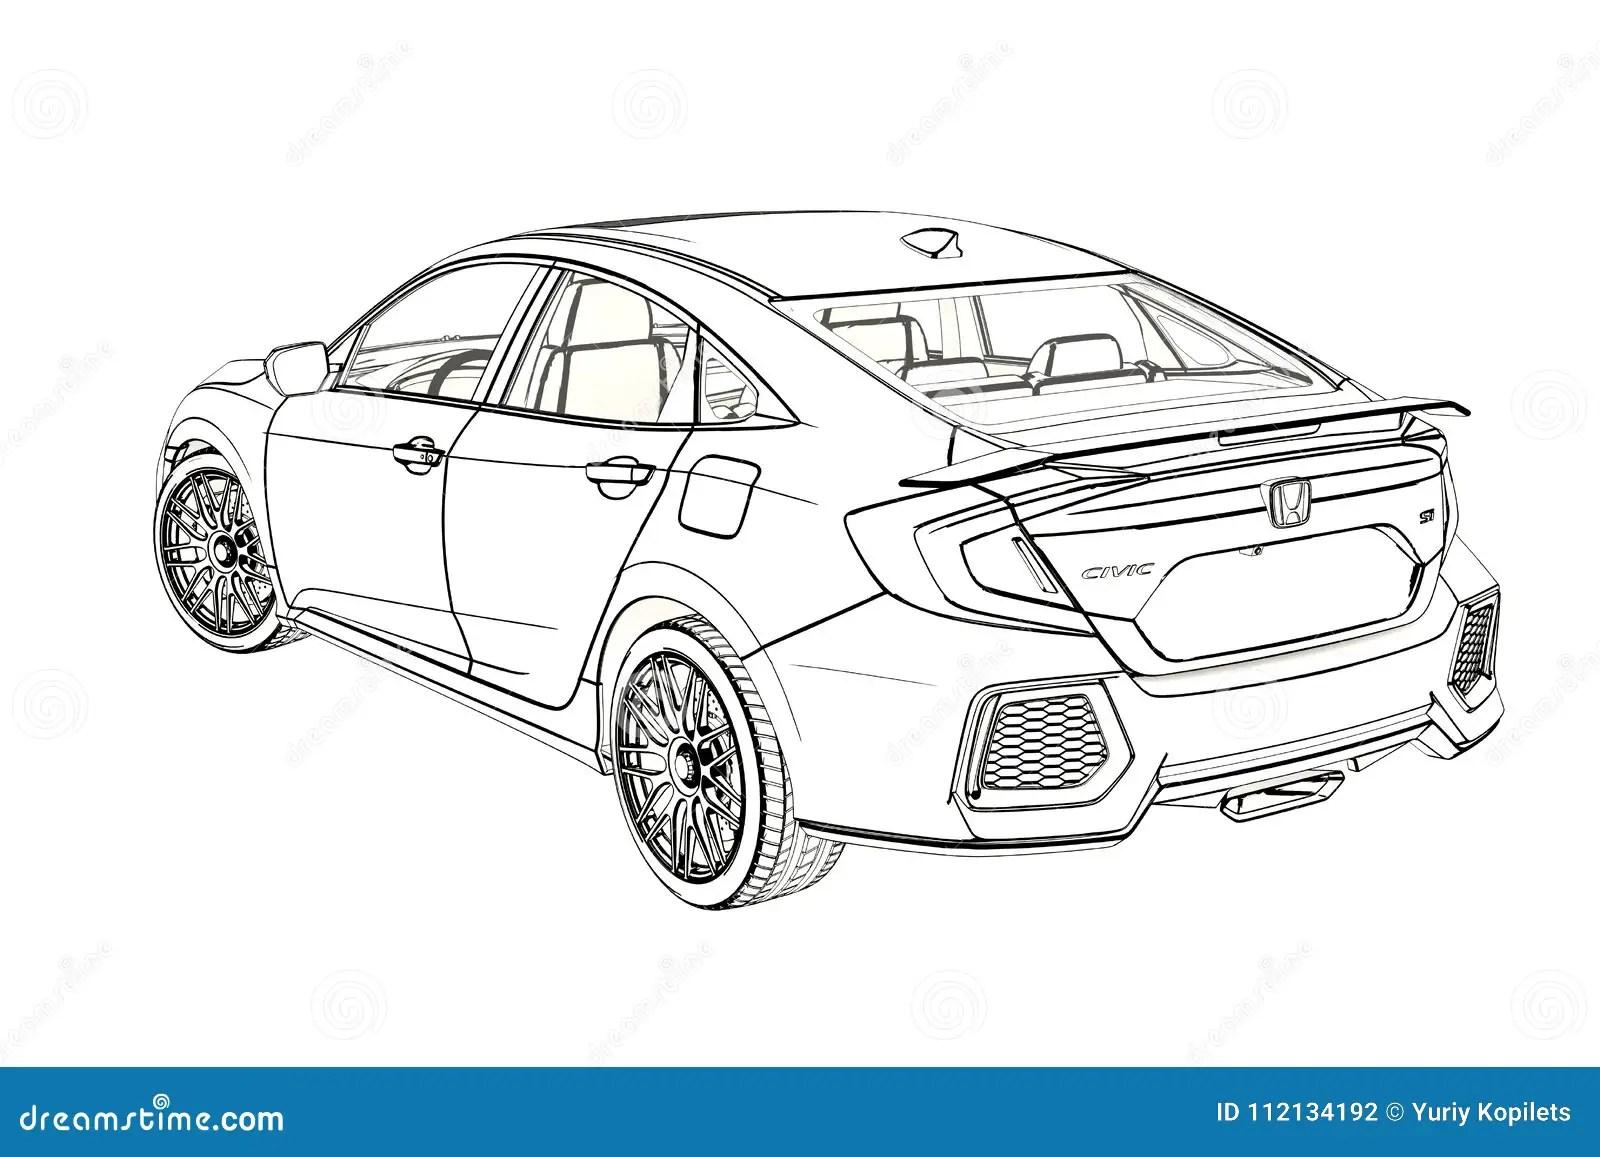 Sedan Honda Civic Graphic Sketch 3d Illustration